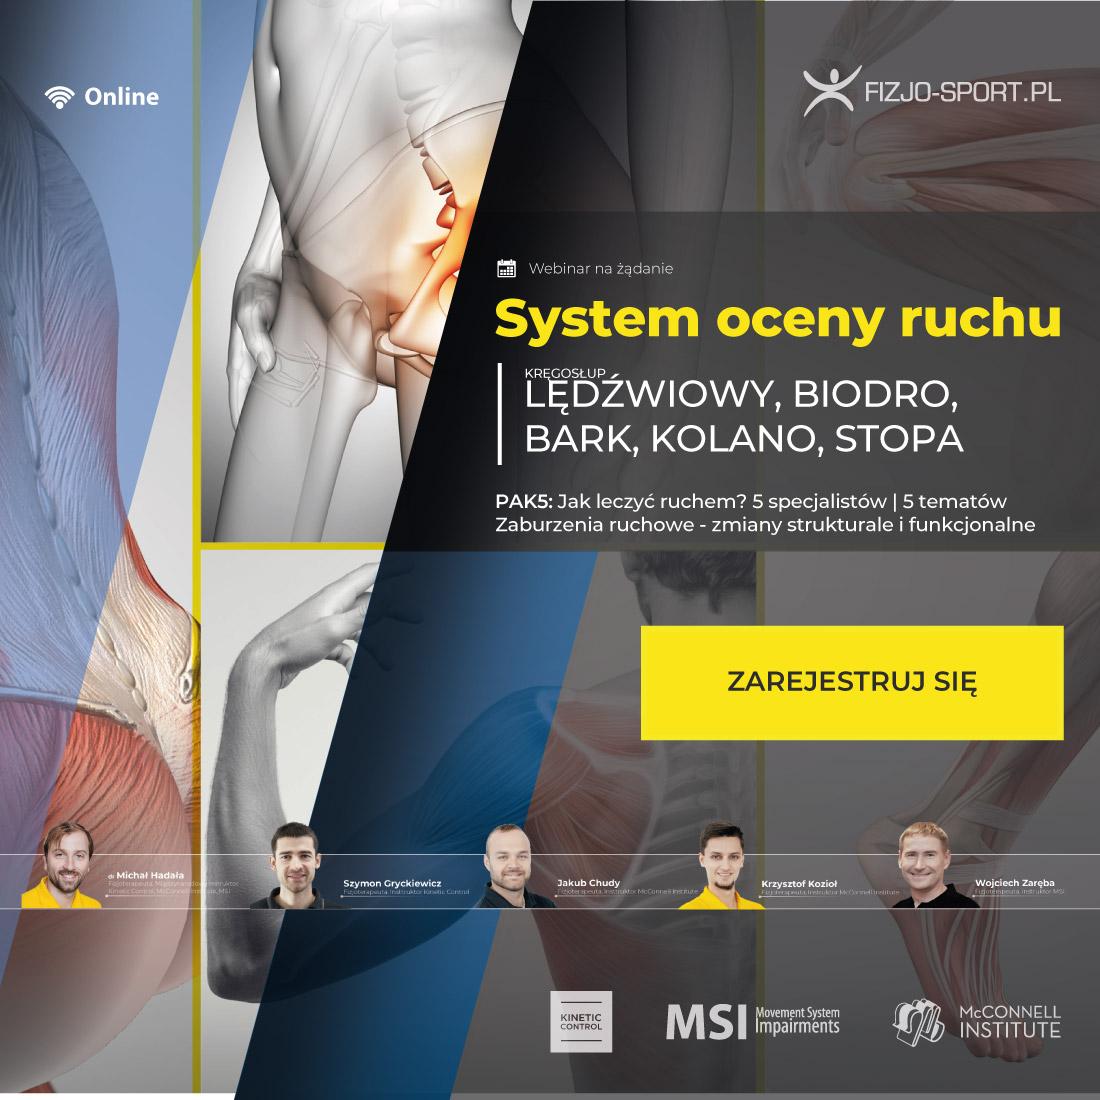 System oceny ruchu - fizjoterapia